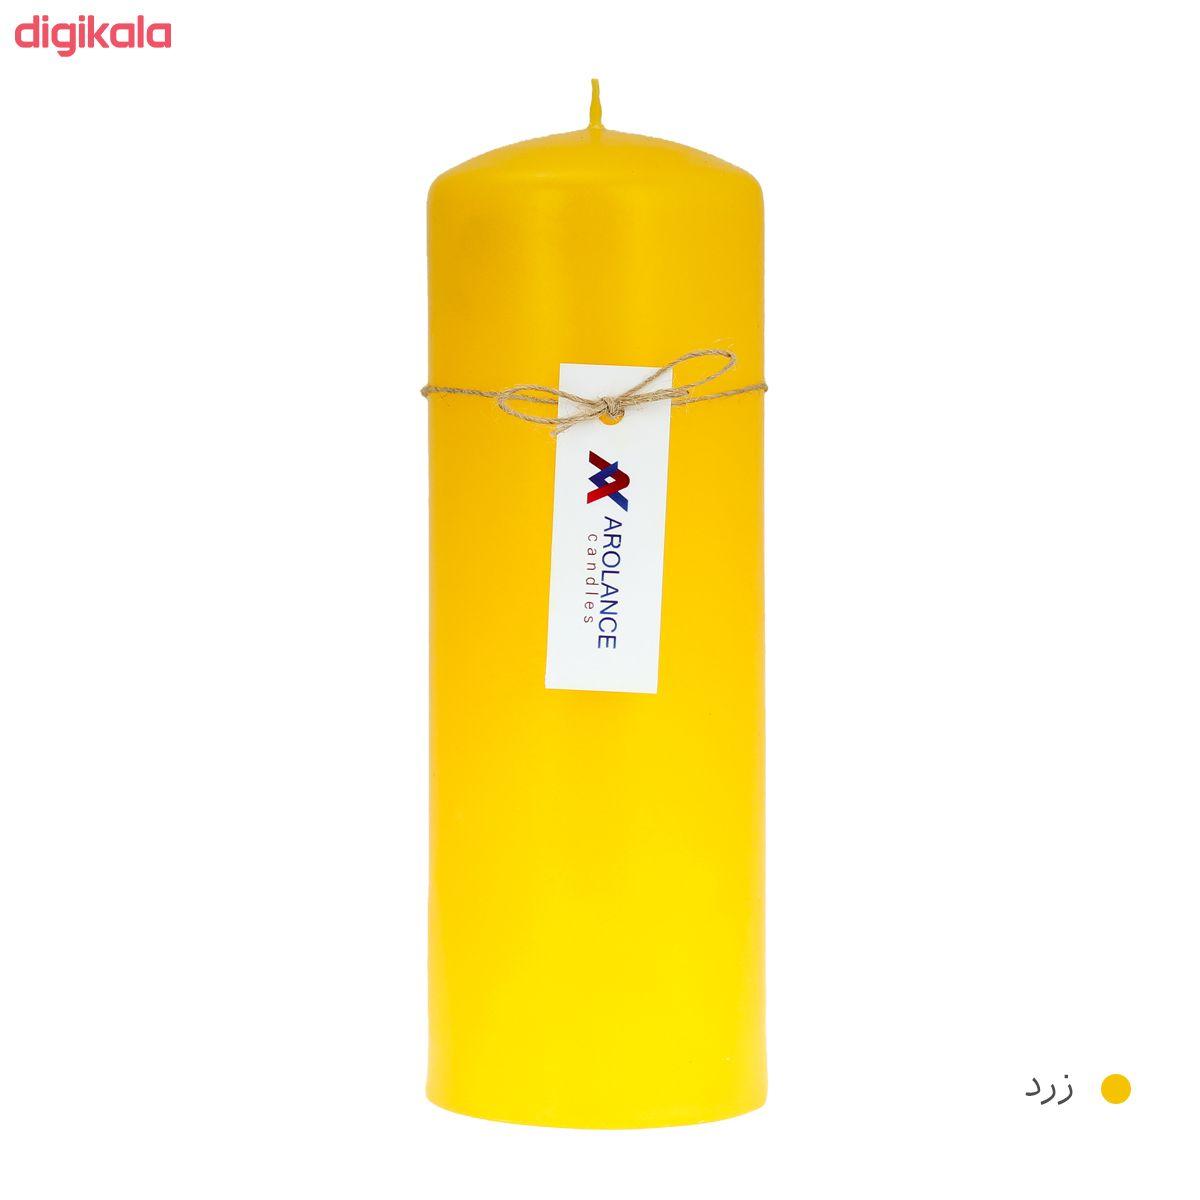 شمع آرولنس طرح استوانه مدل D720 main 1 6